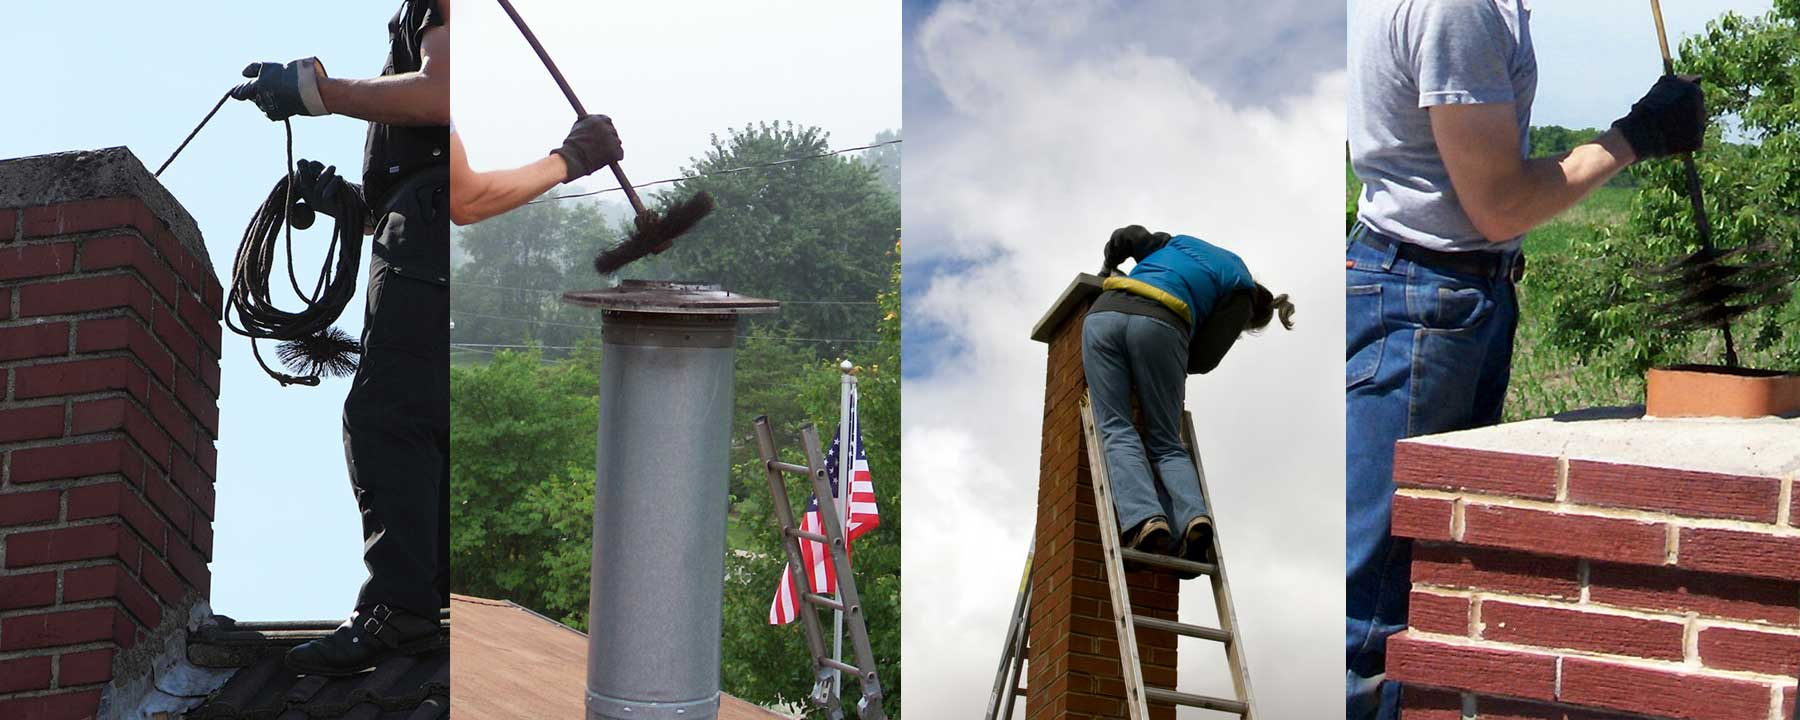 Chimney Cleaning Chimney Sweep Boonton Nj